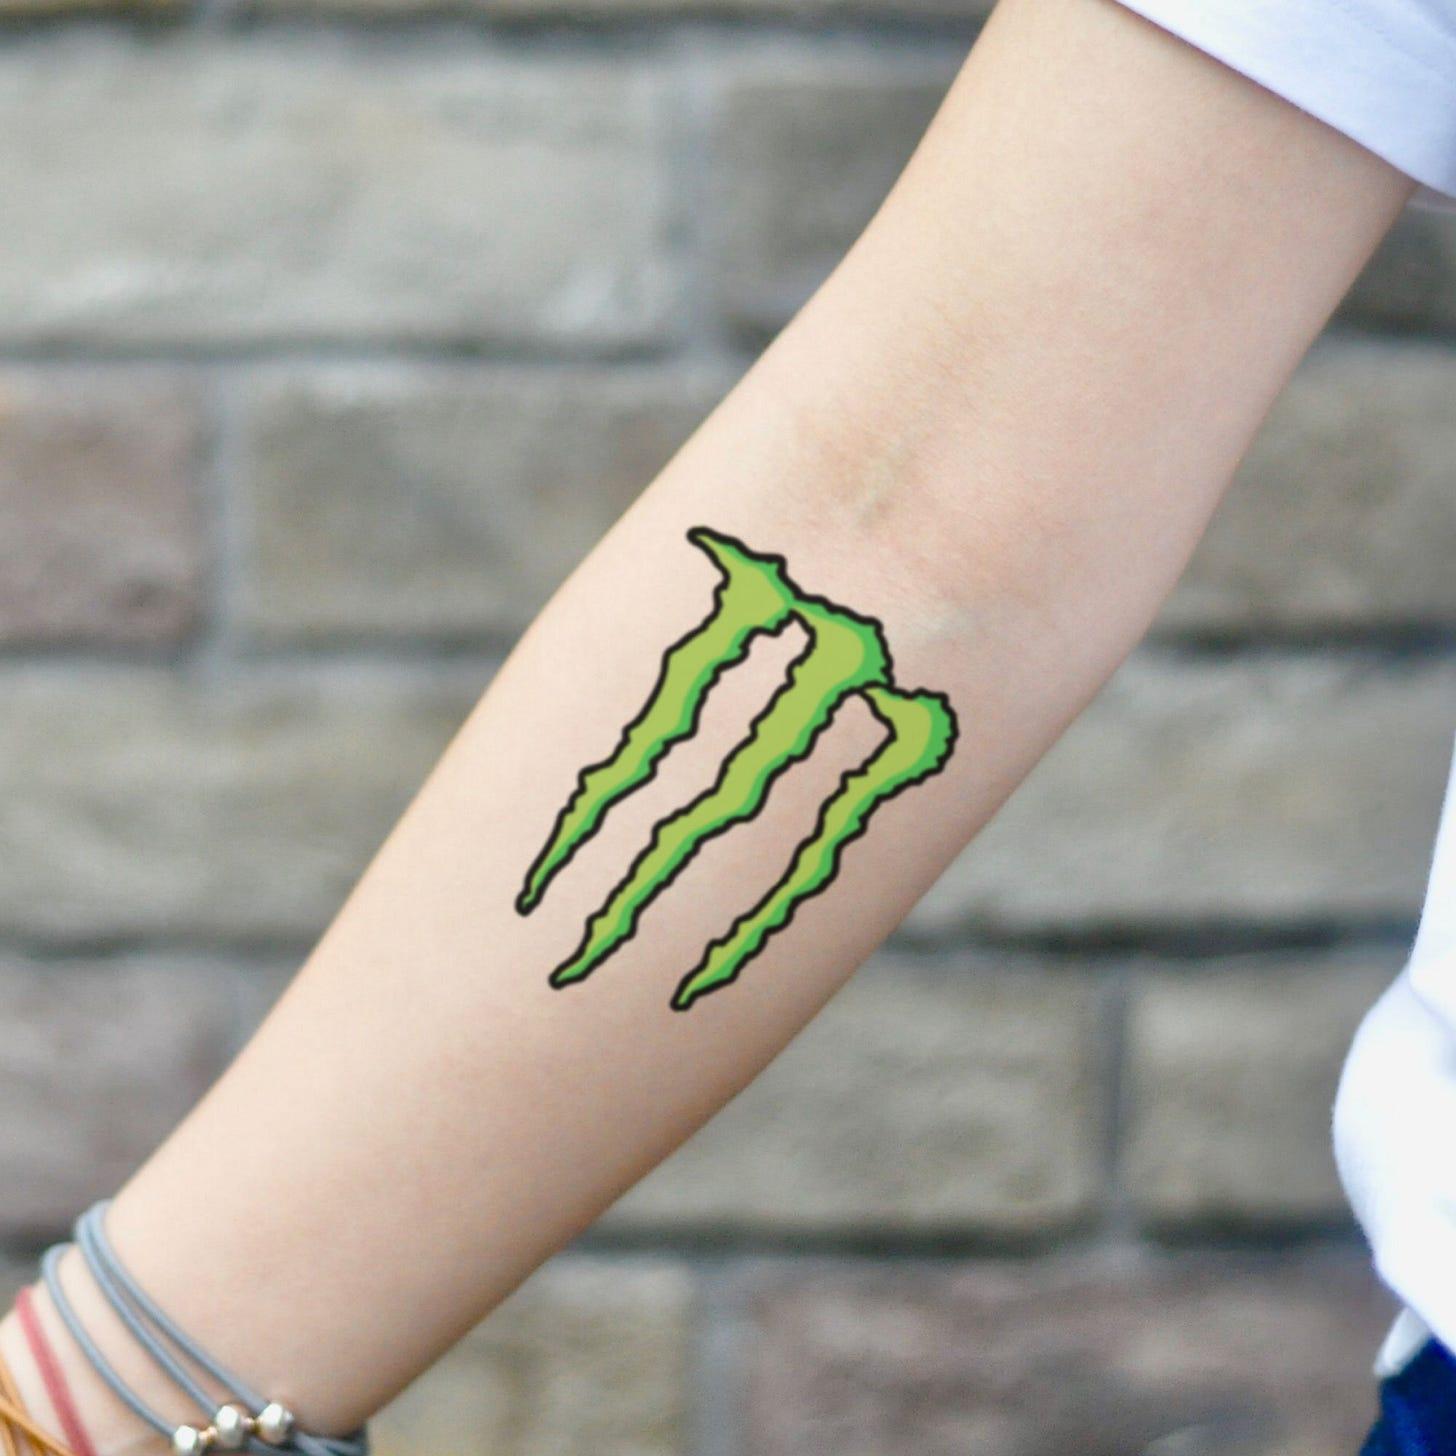 Monster Energy Drink Logo Temporary Tattoo Sticker - OhMyTat